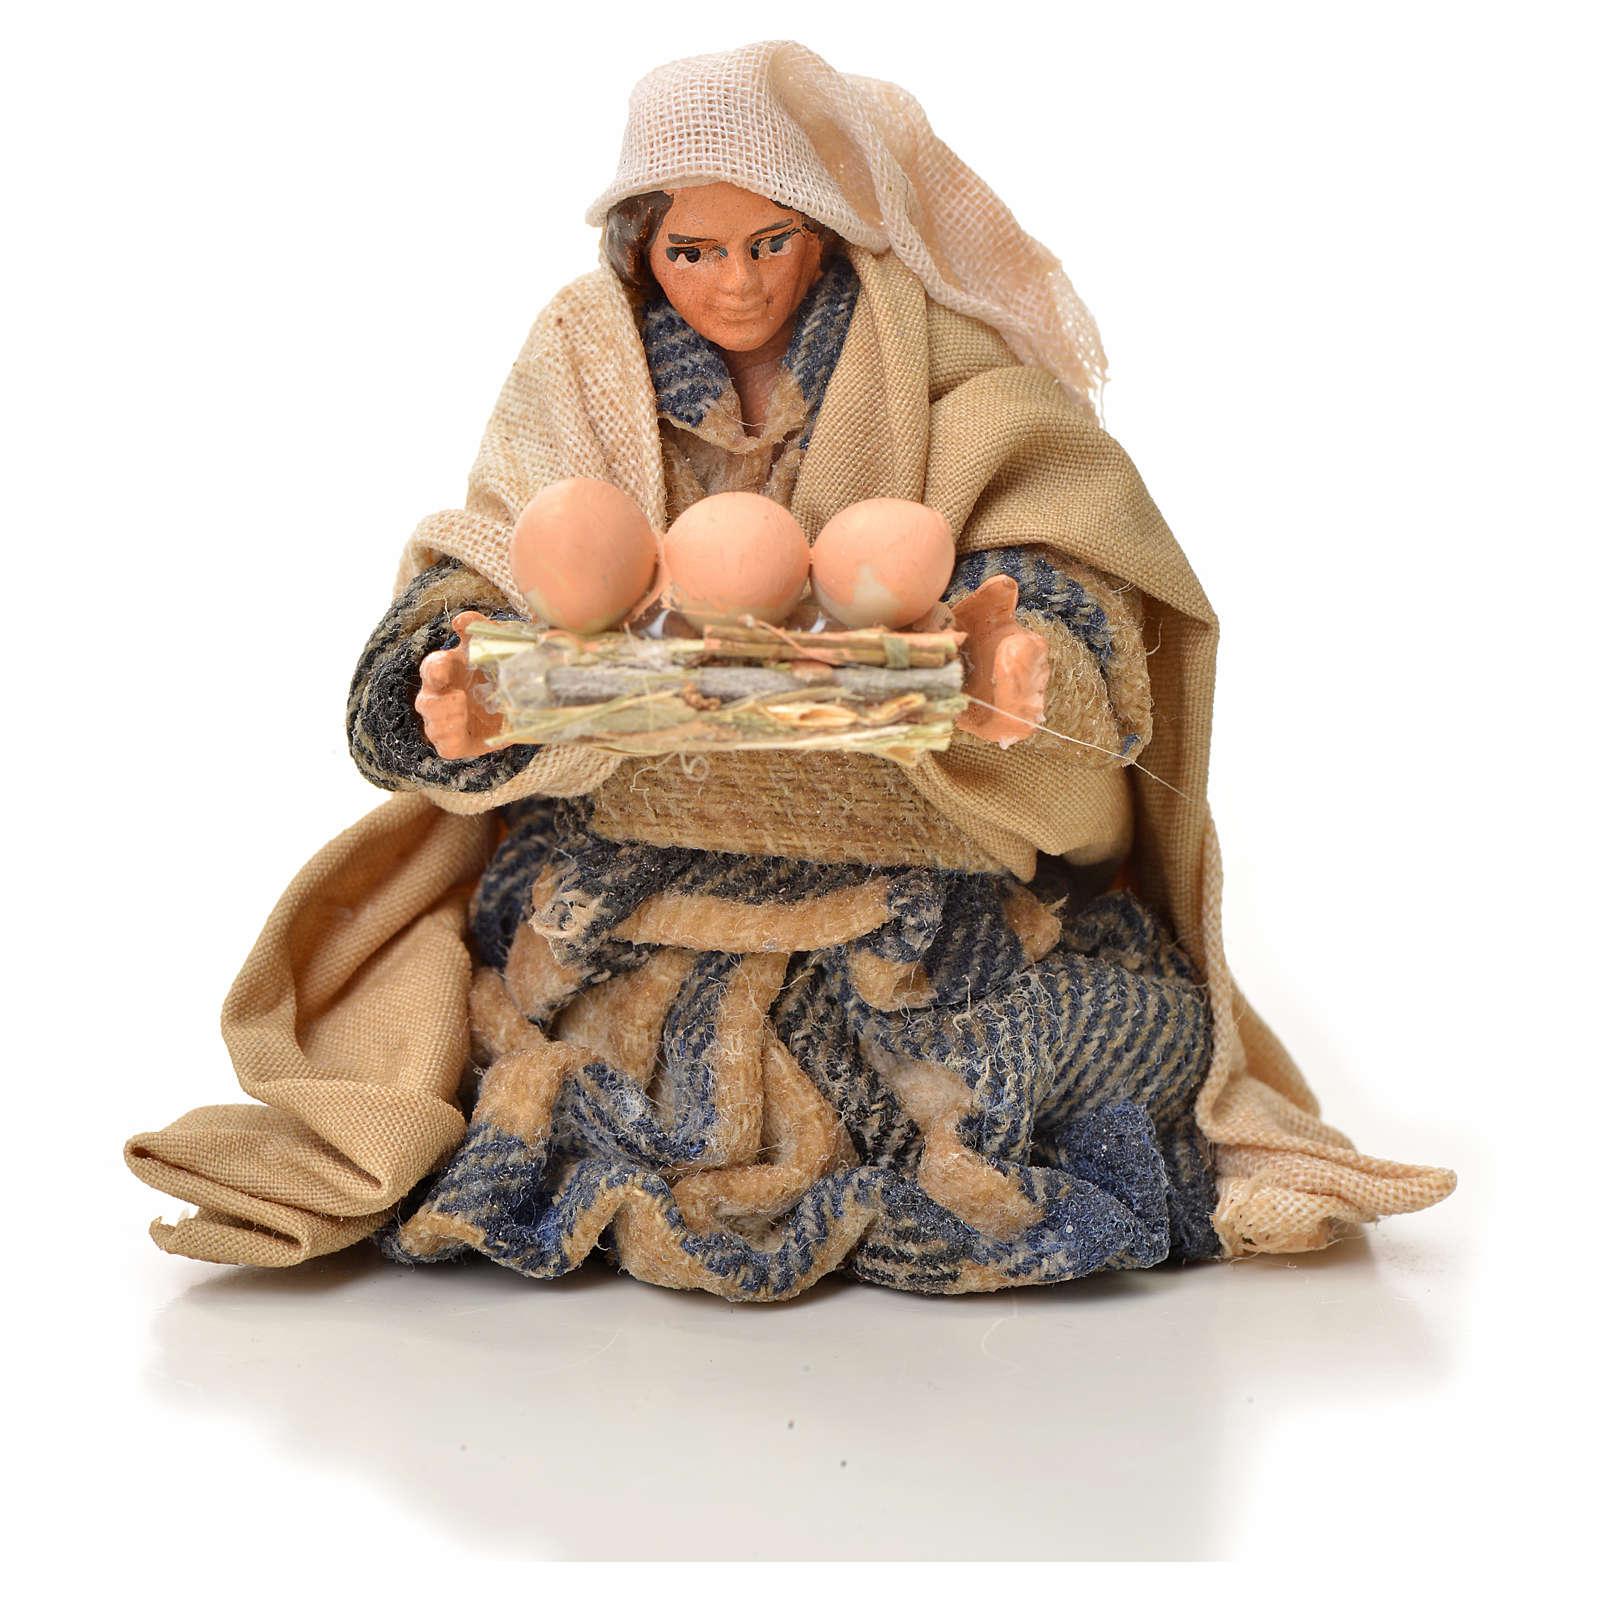 Neapolitan Nativity figurine, man with eggs, 6 cm 4